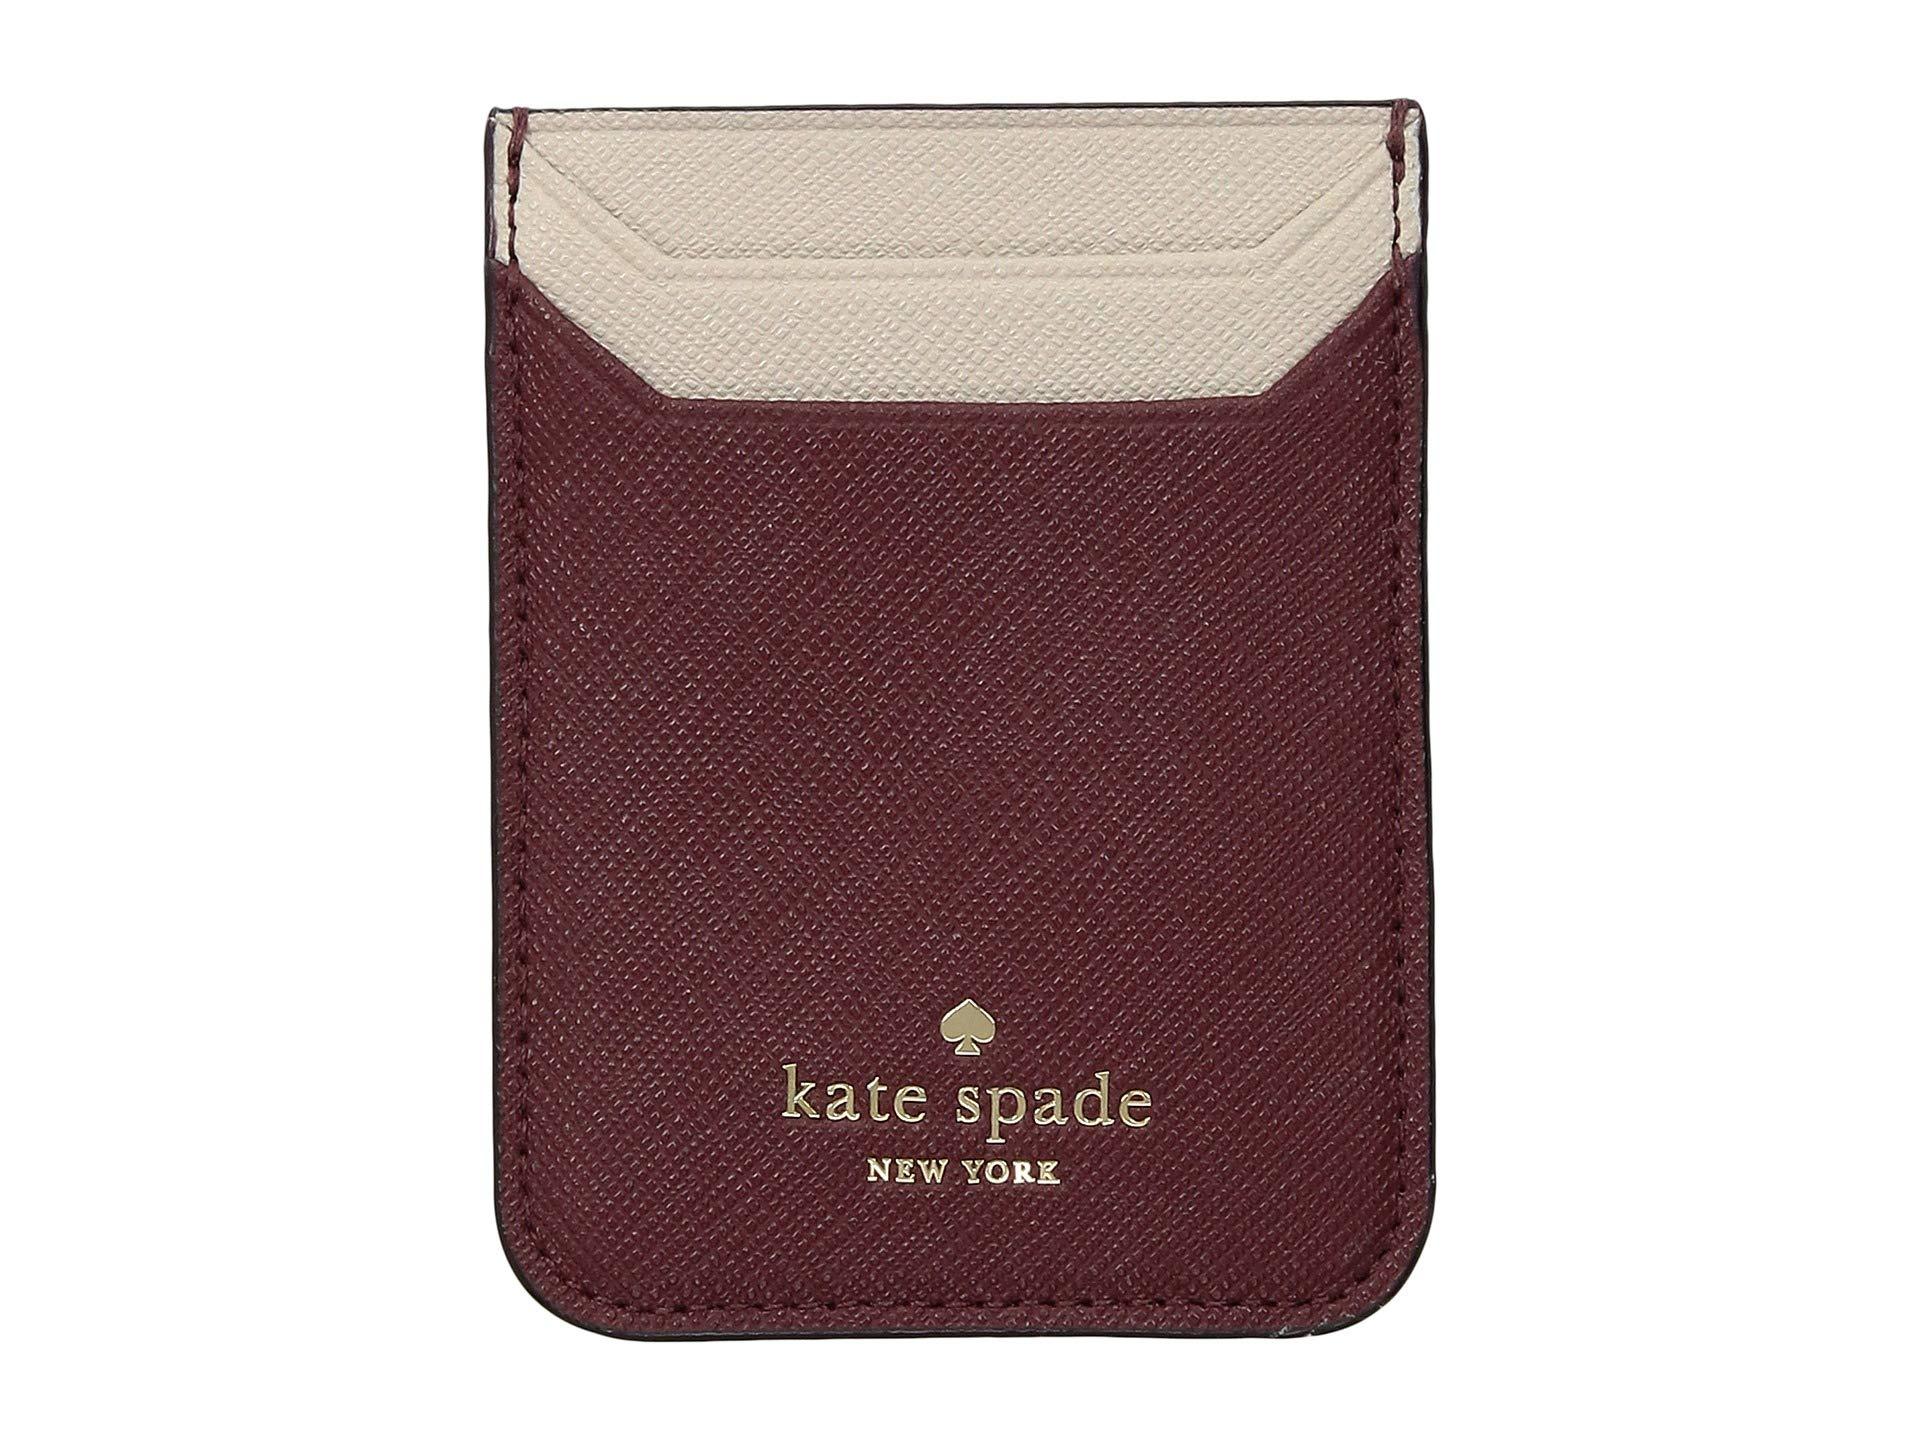 Spade Triple Kate Sienna Sticker York New tusk Pocket vtzgzqdxw